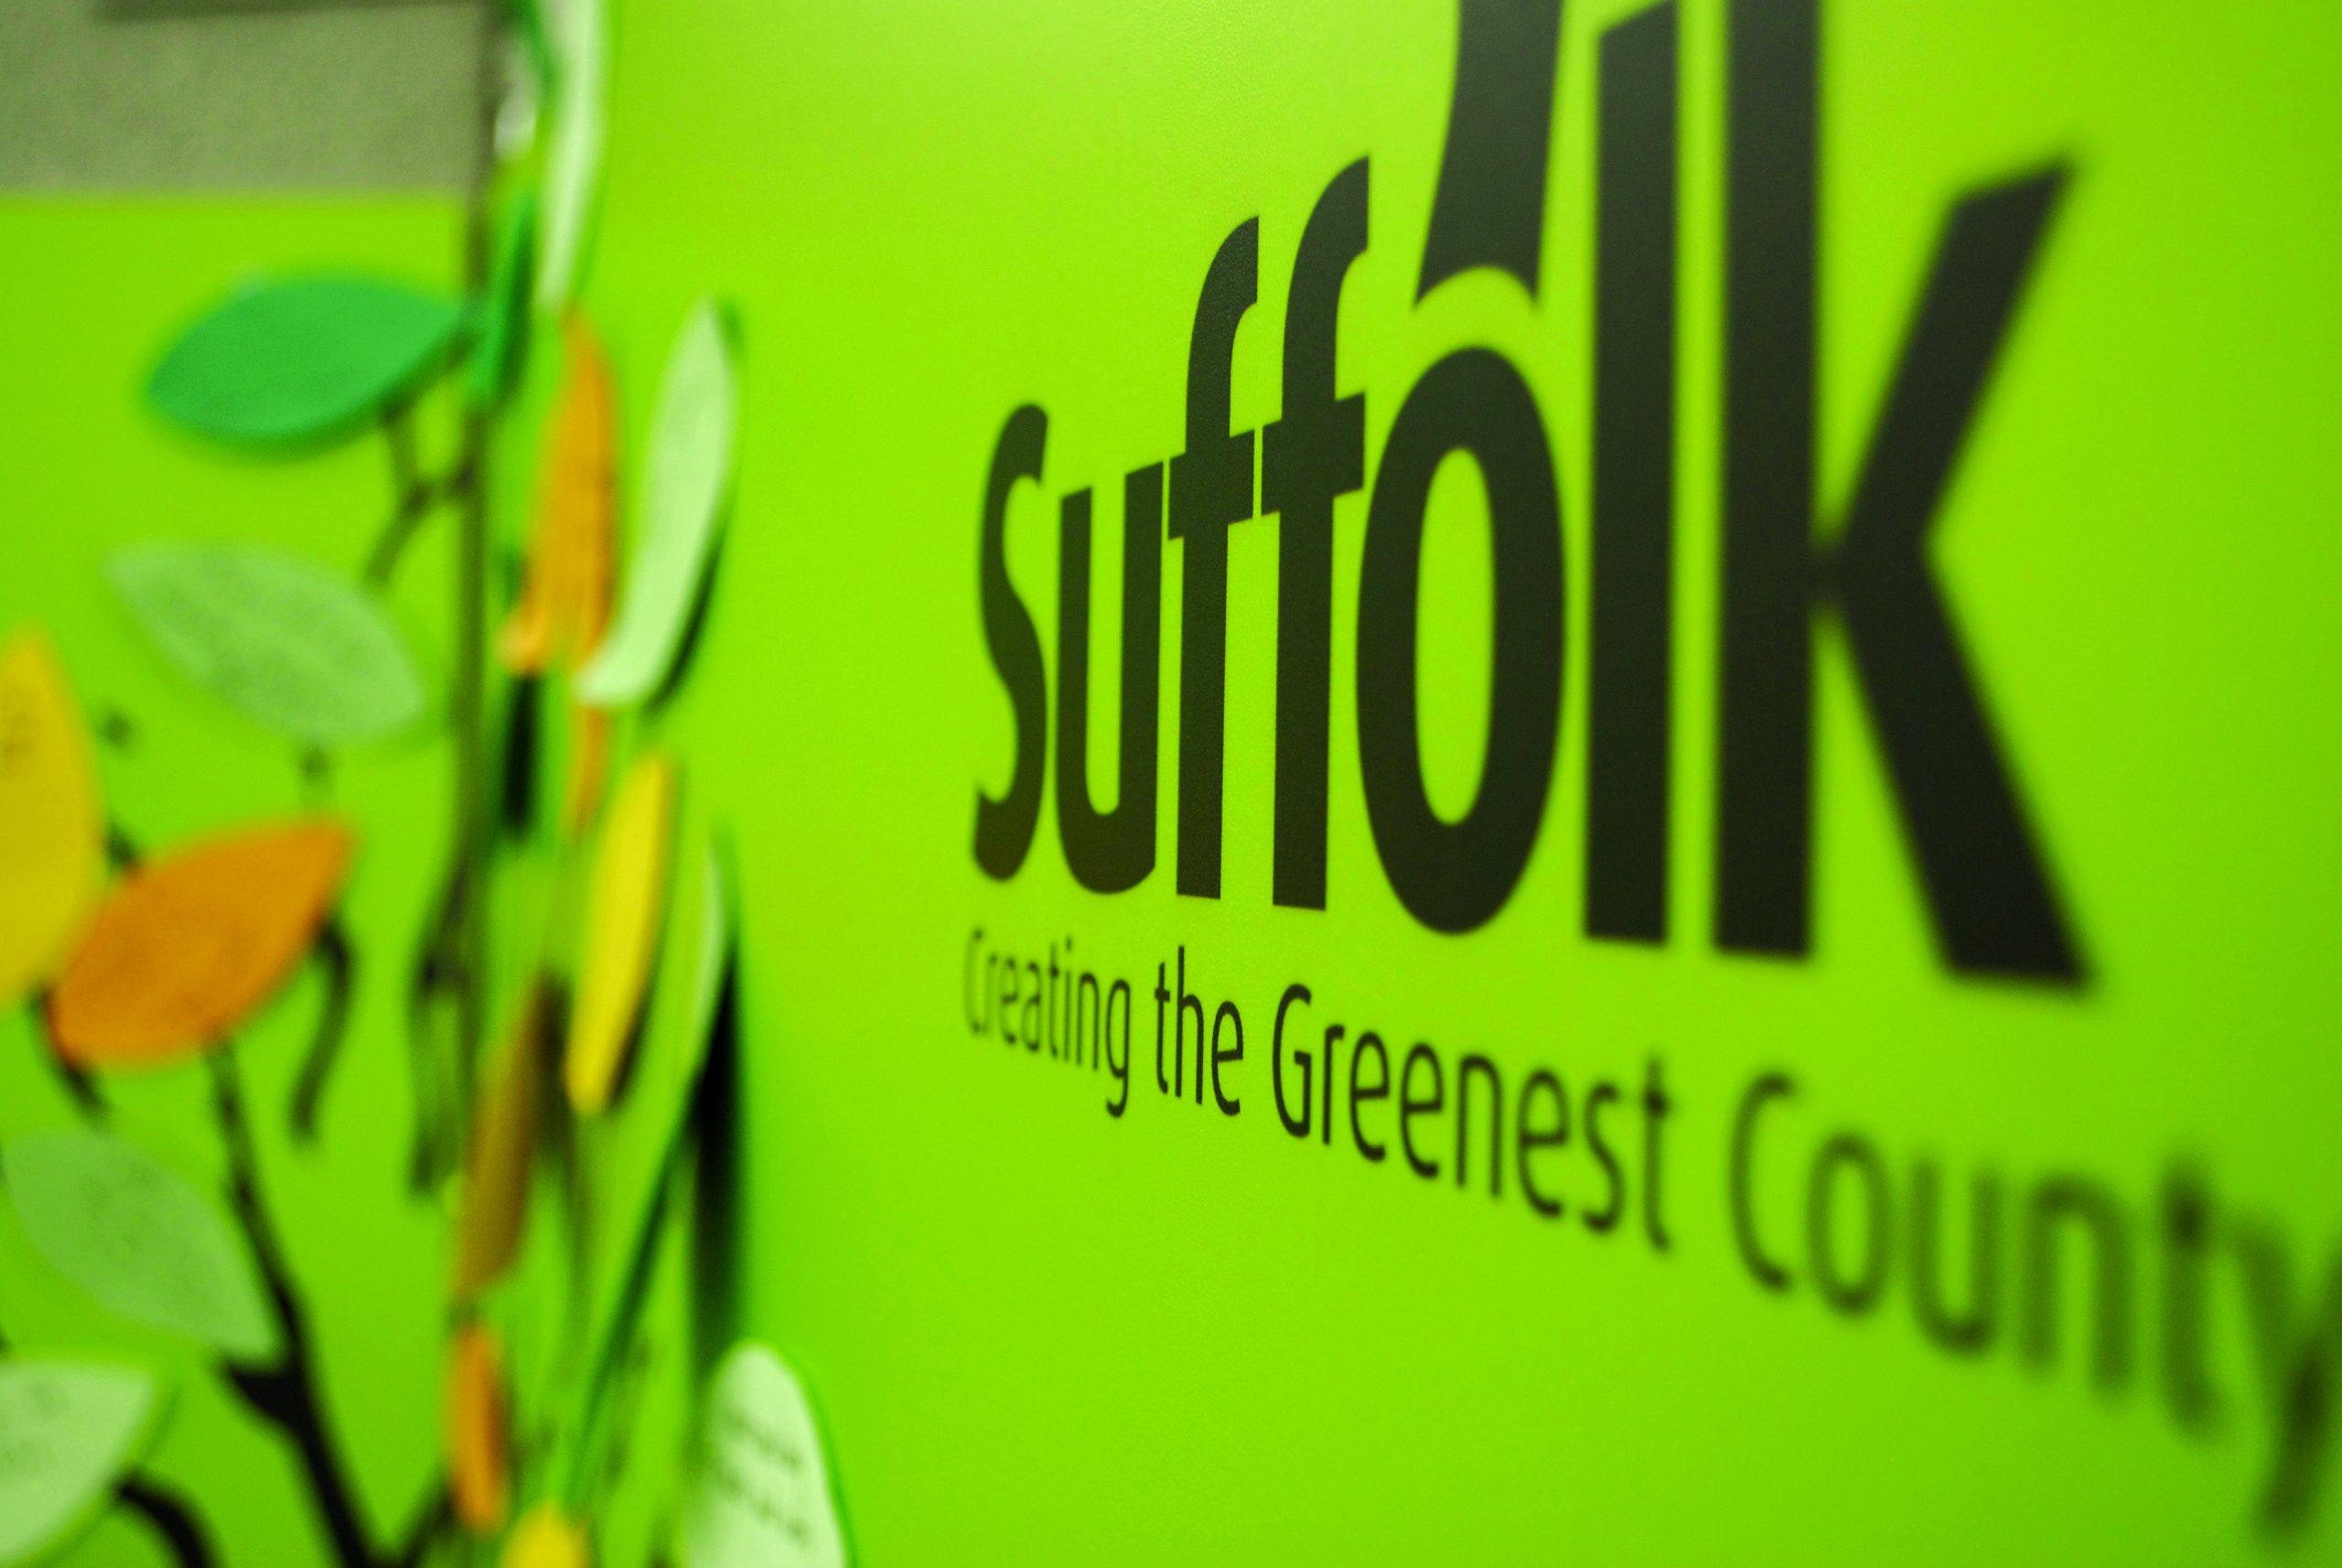 Green Suffolk Logo close up